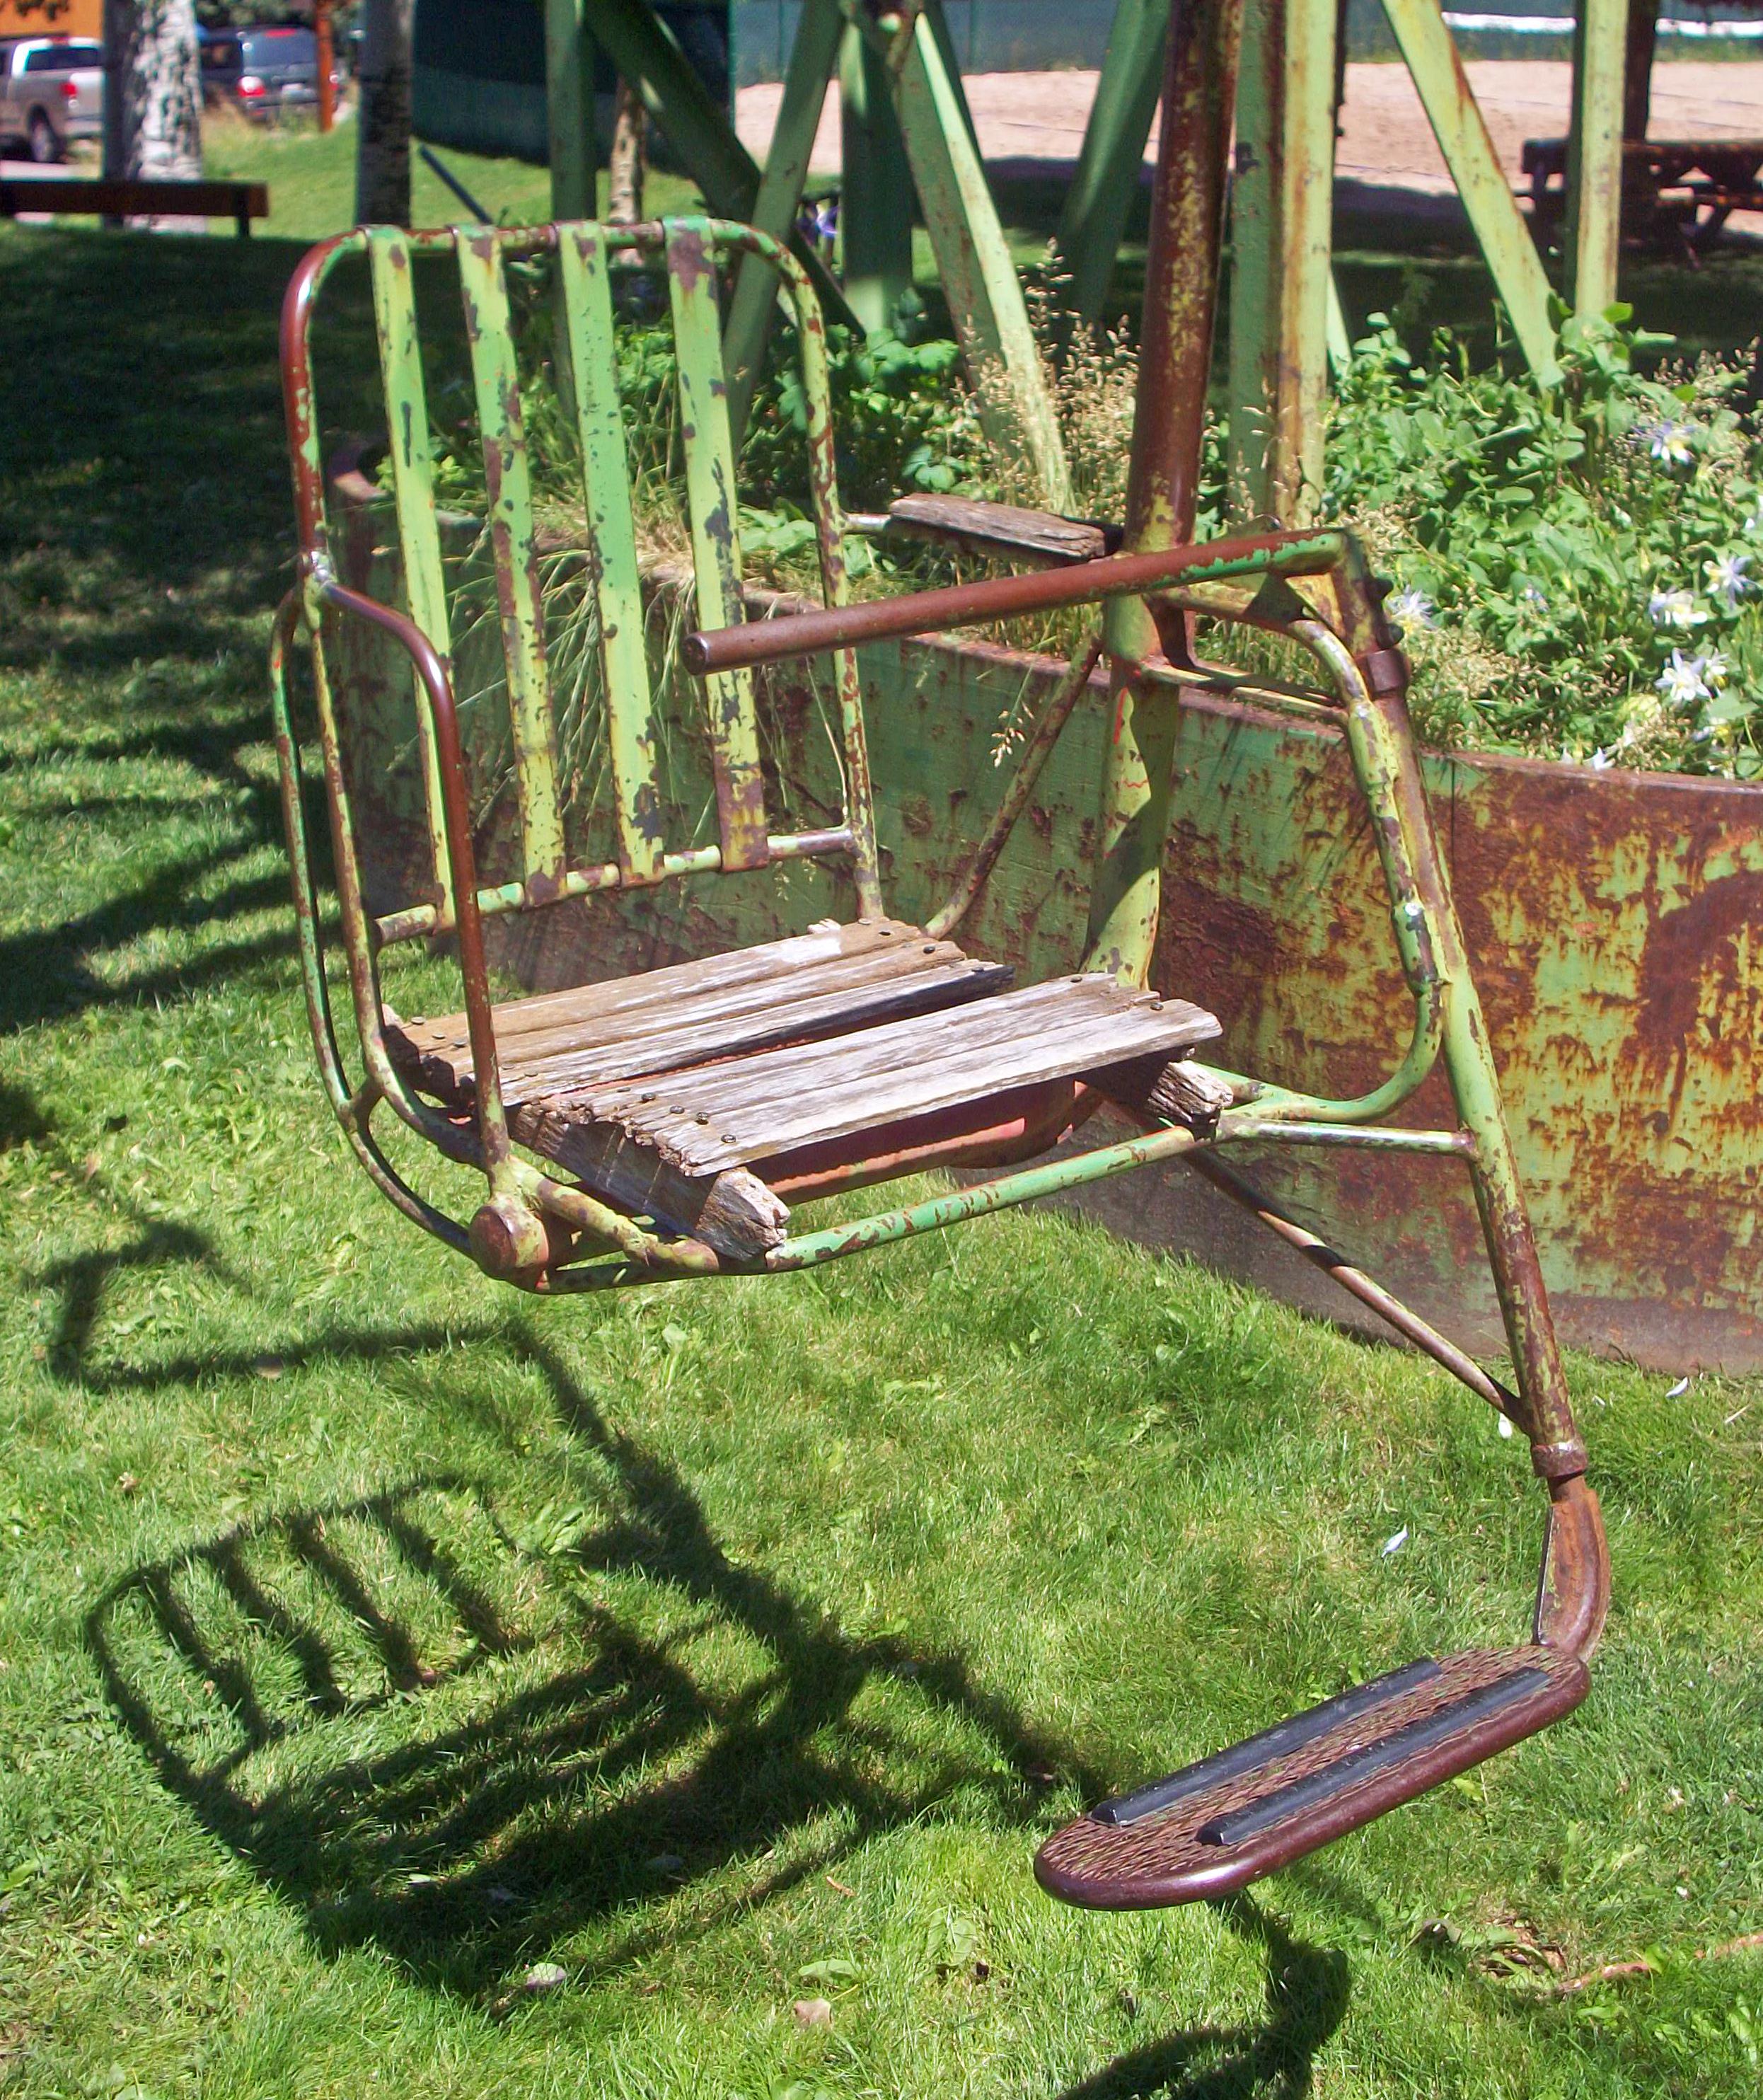 File:Ski Lift No 1 chair, Aspen, CO.jpg - Wikimedia Commons